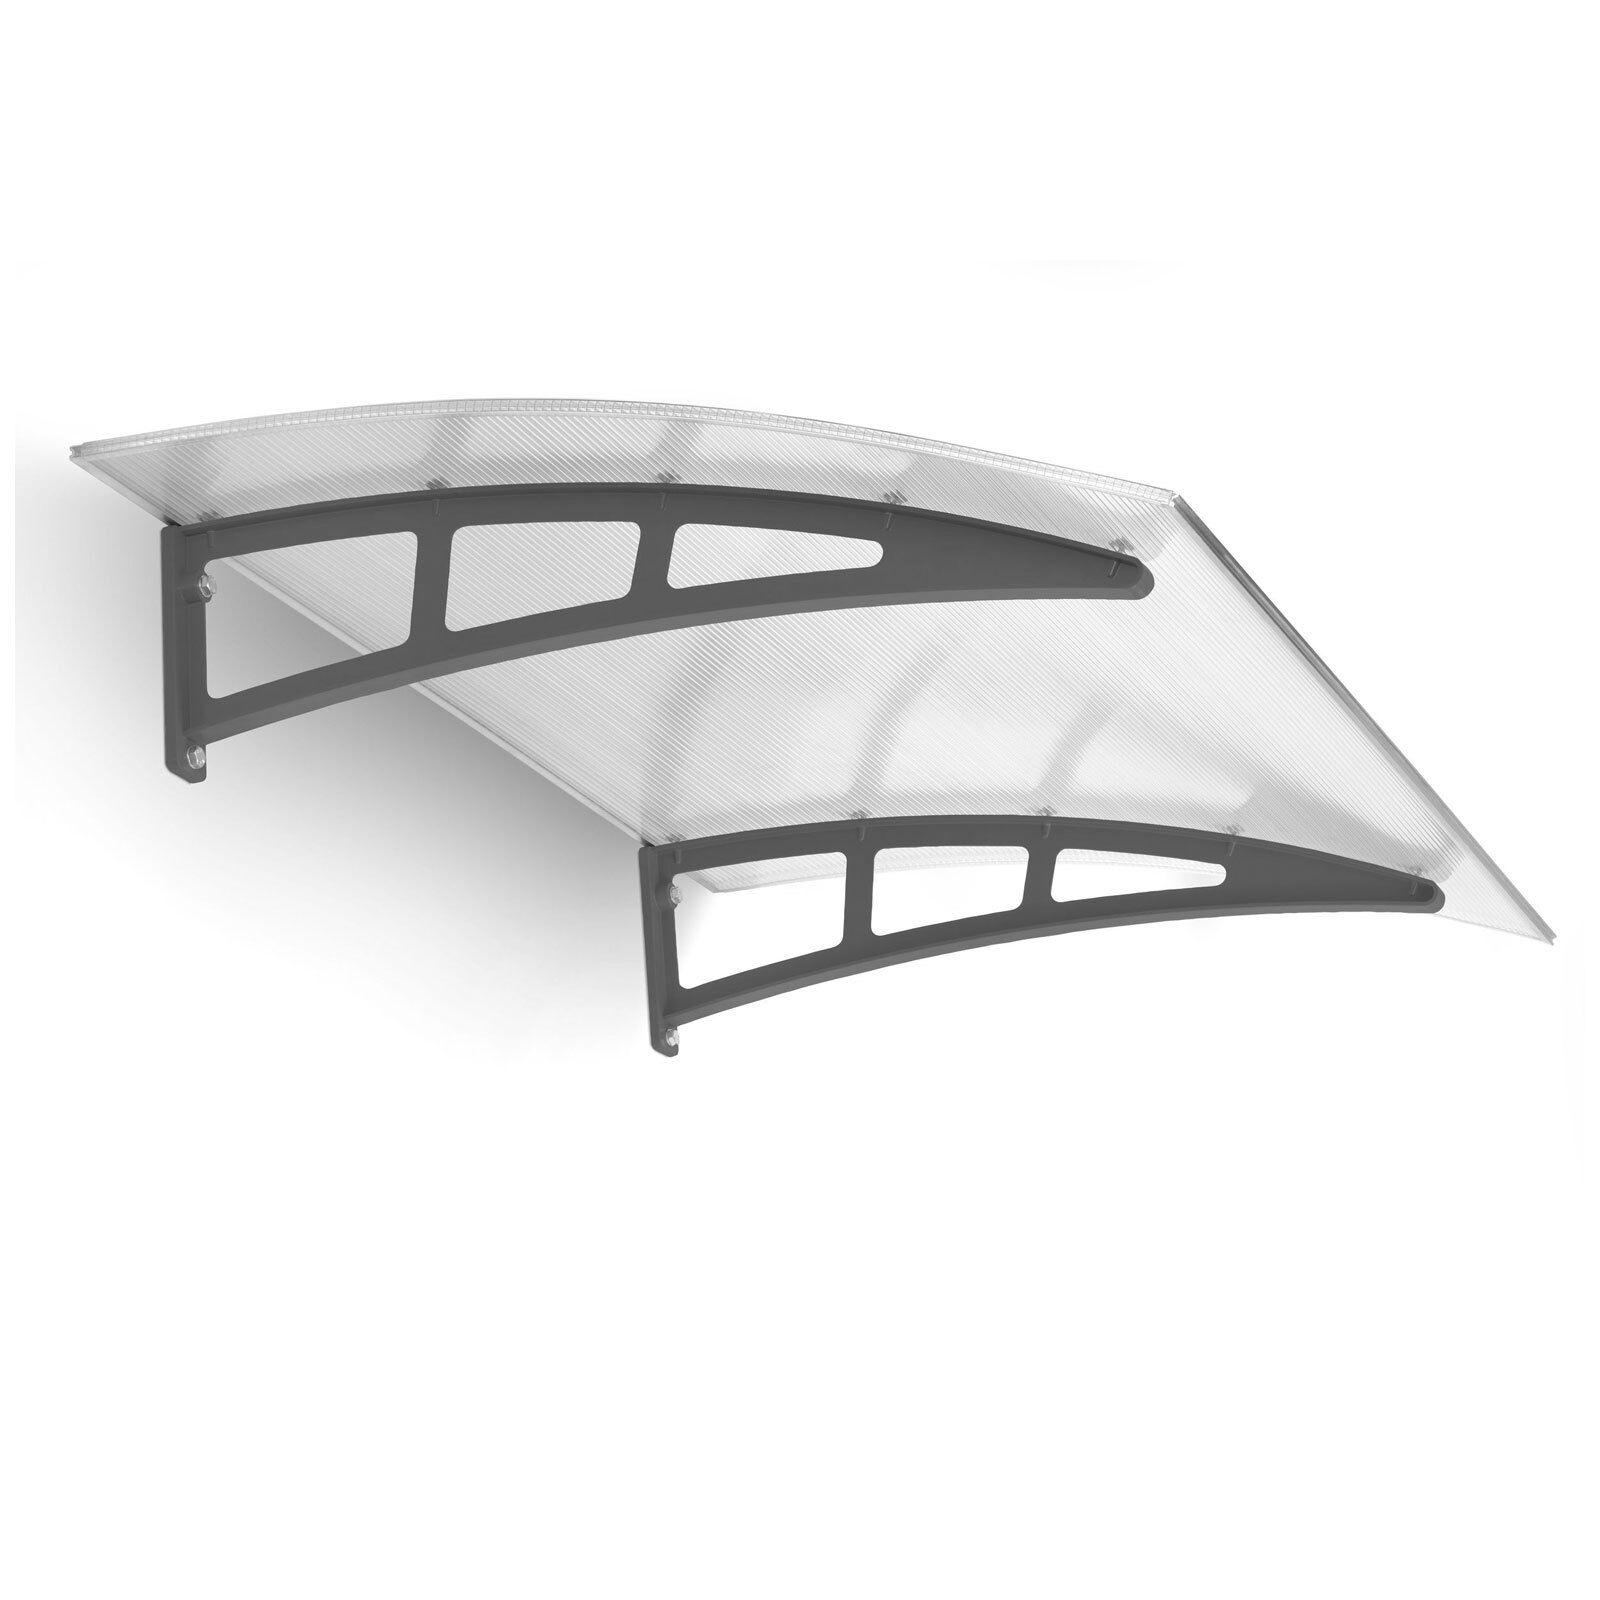 Pultvordach Türvordach Überdachung Kunststoff Polycarbonat Vordach Vordach Vordach Schulte c743e3